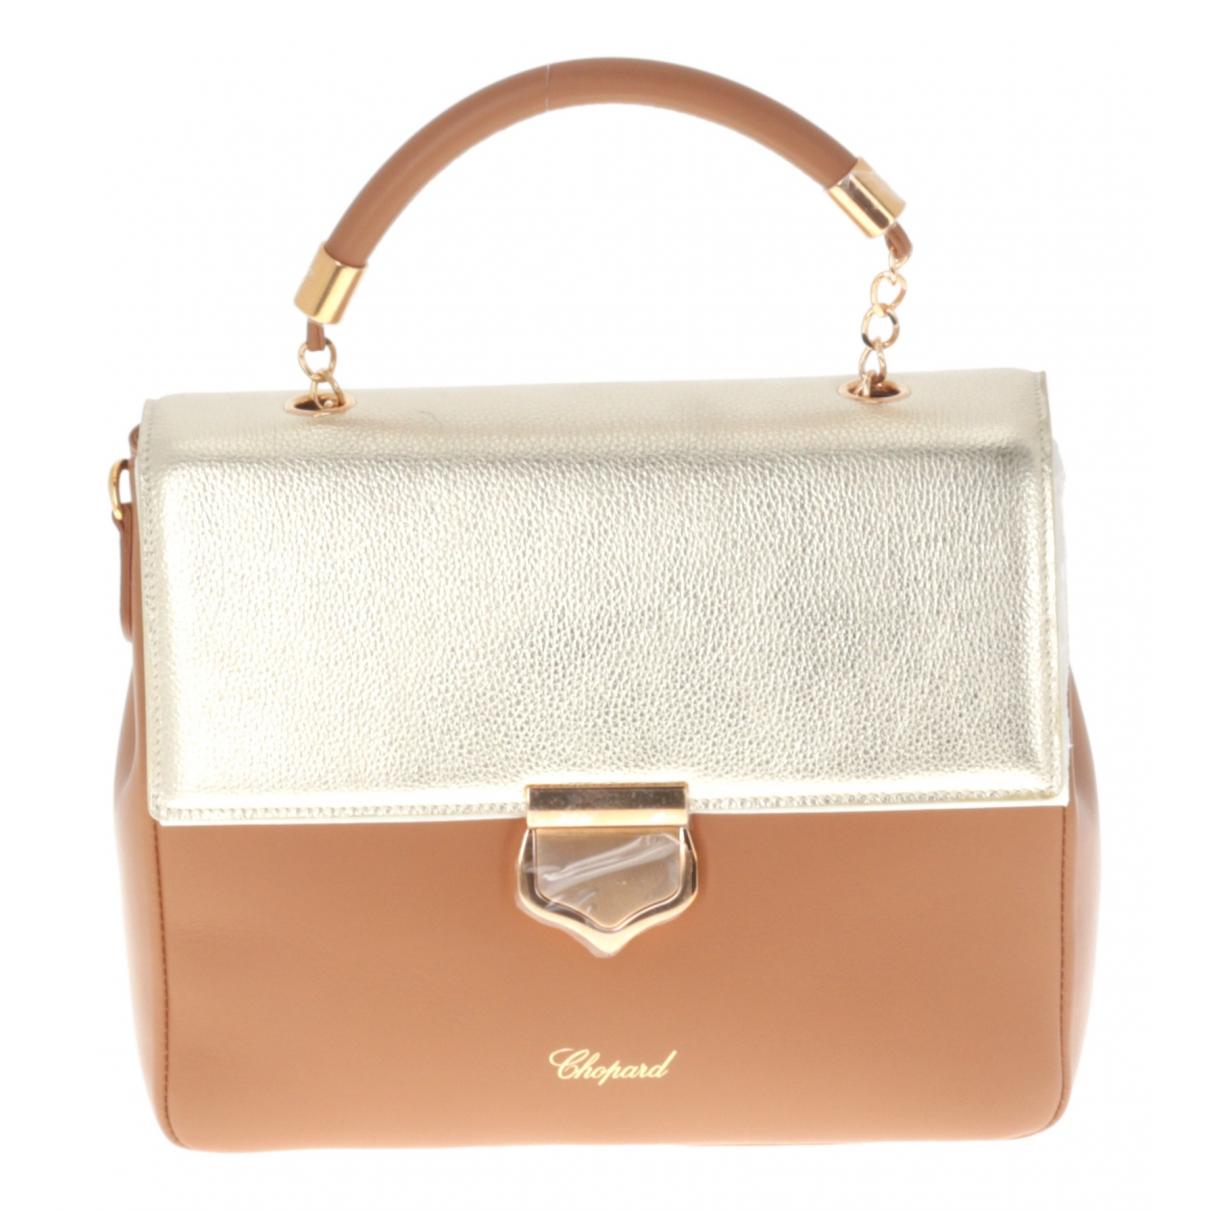 Chopard N Beige Leather handbag for Women N